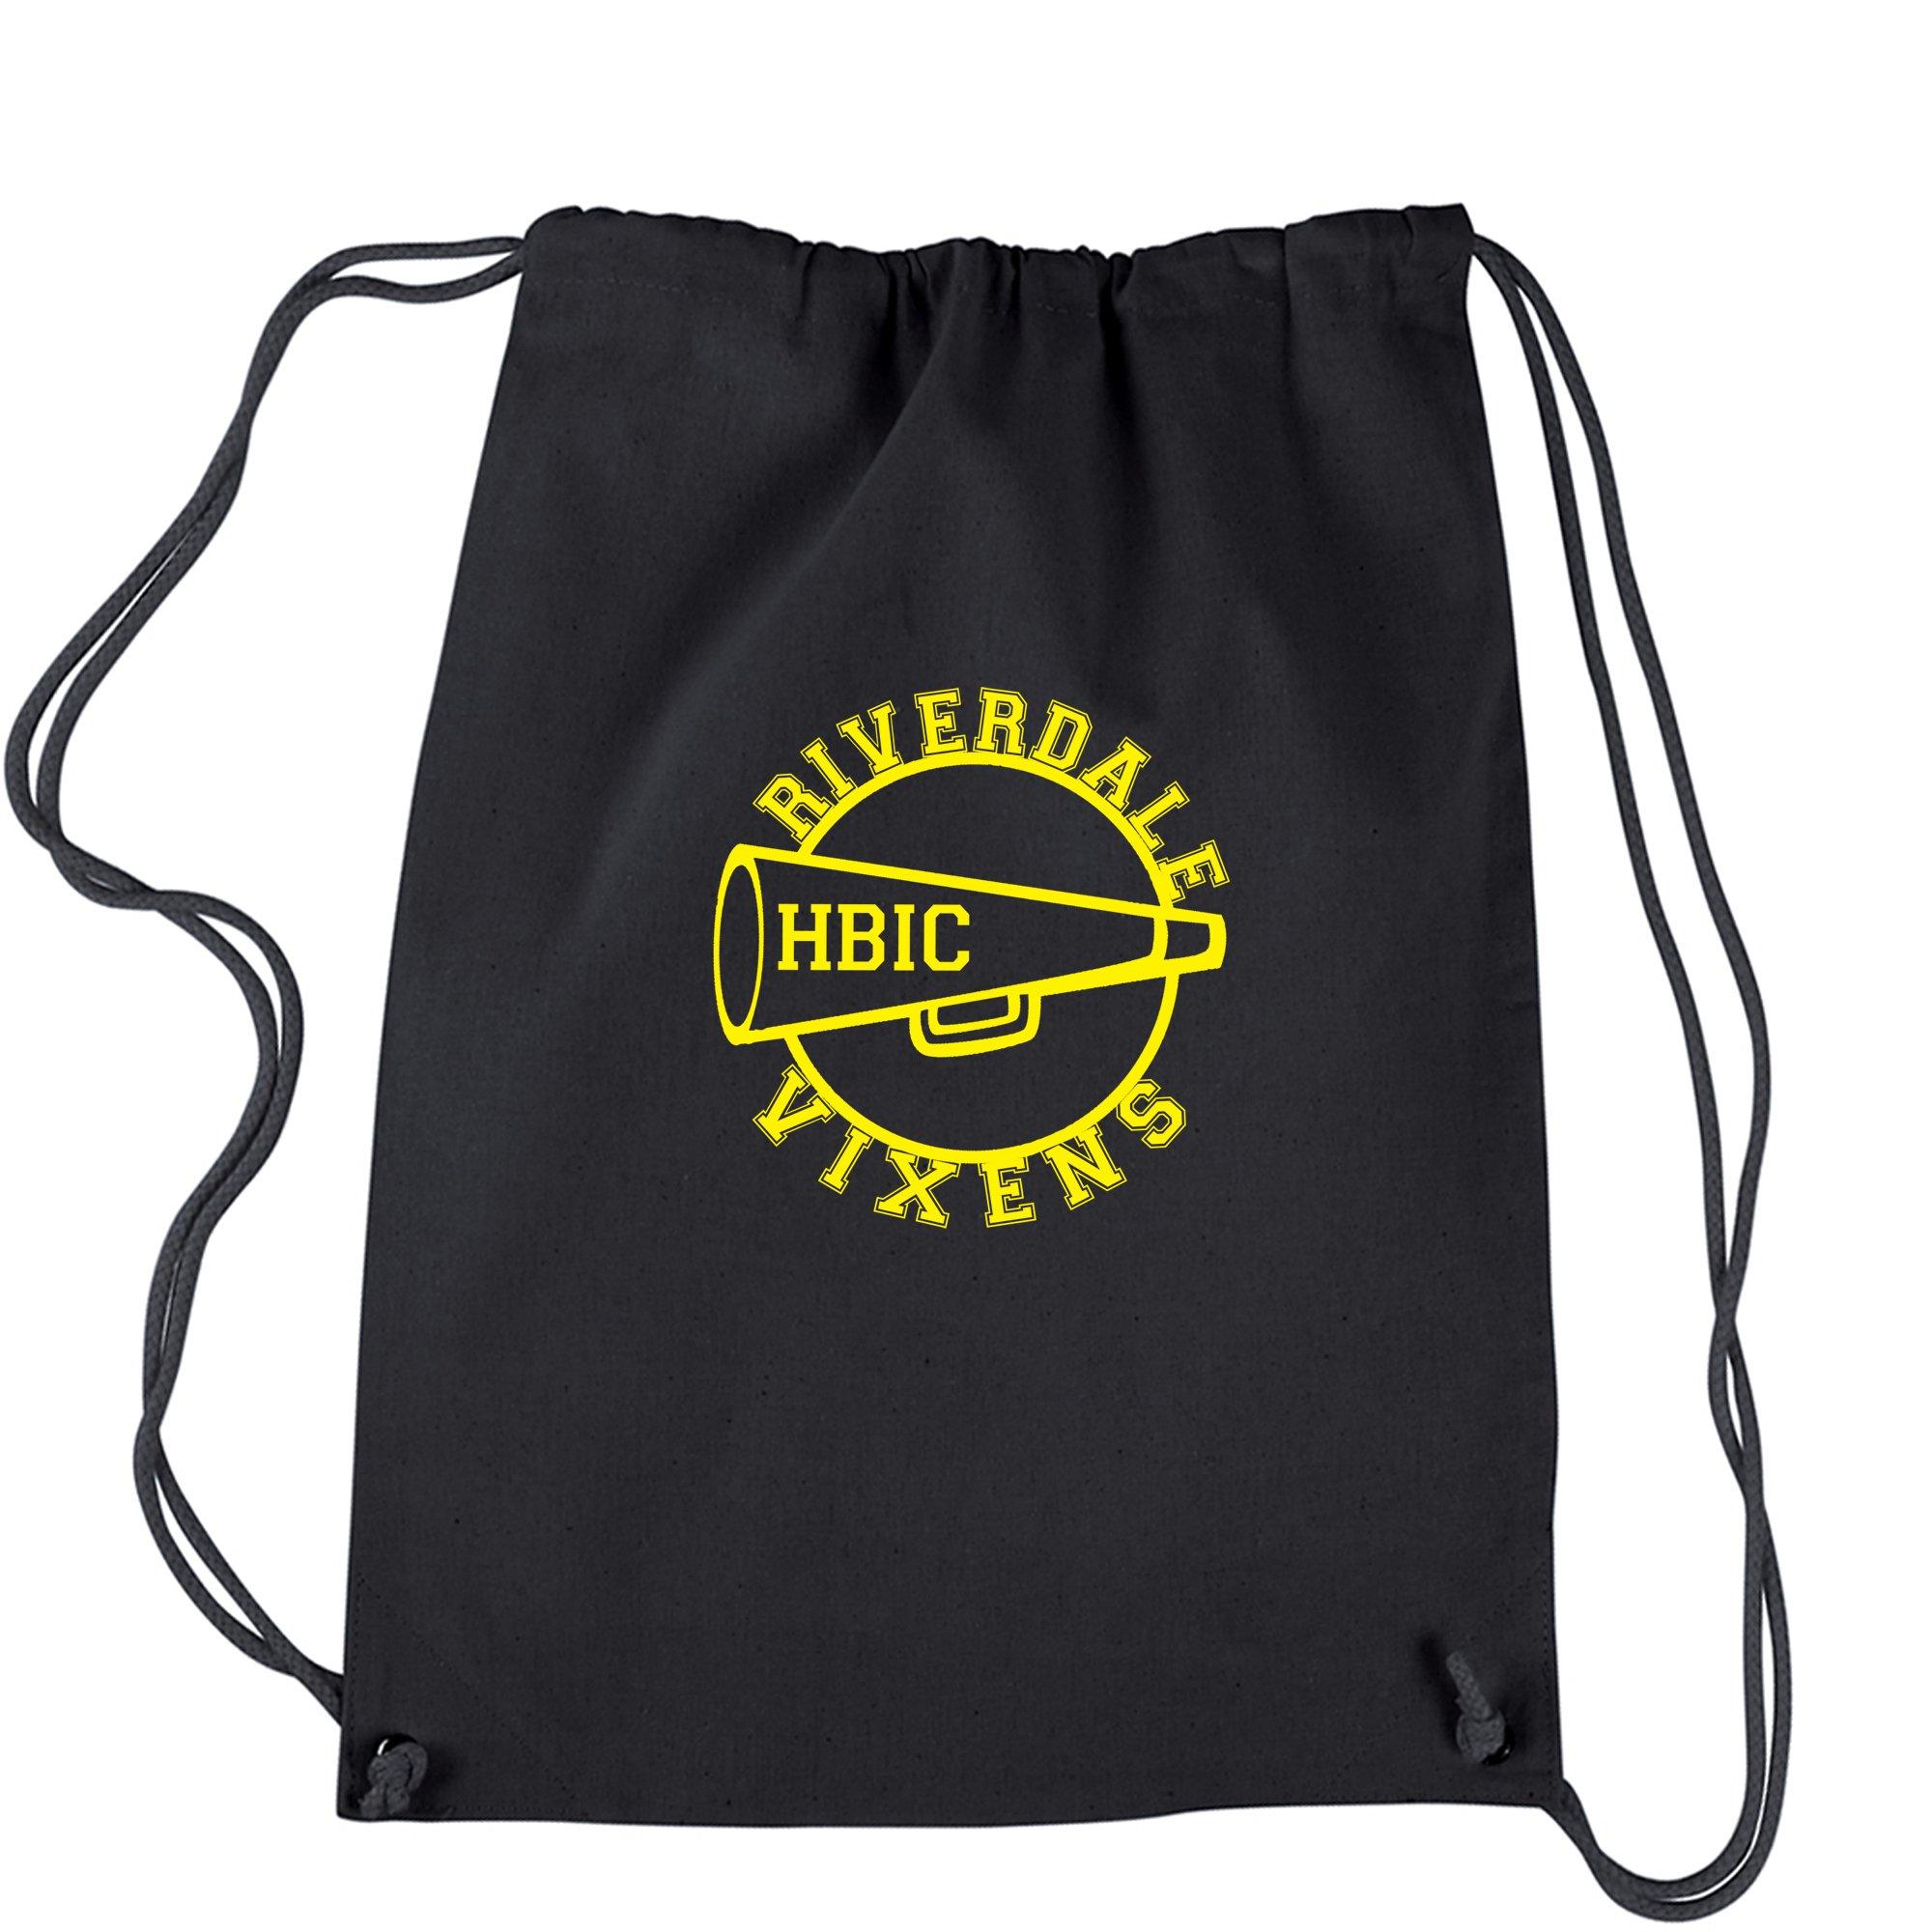 Backpack Riverdale Vixens Cheerleading Black Drawstring Backpack